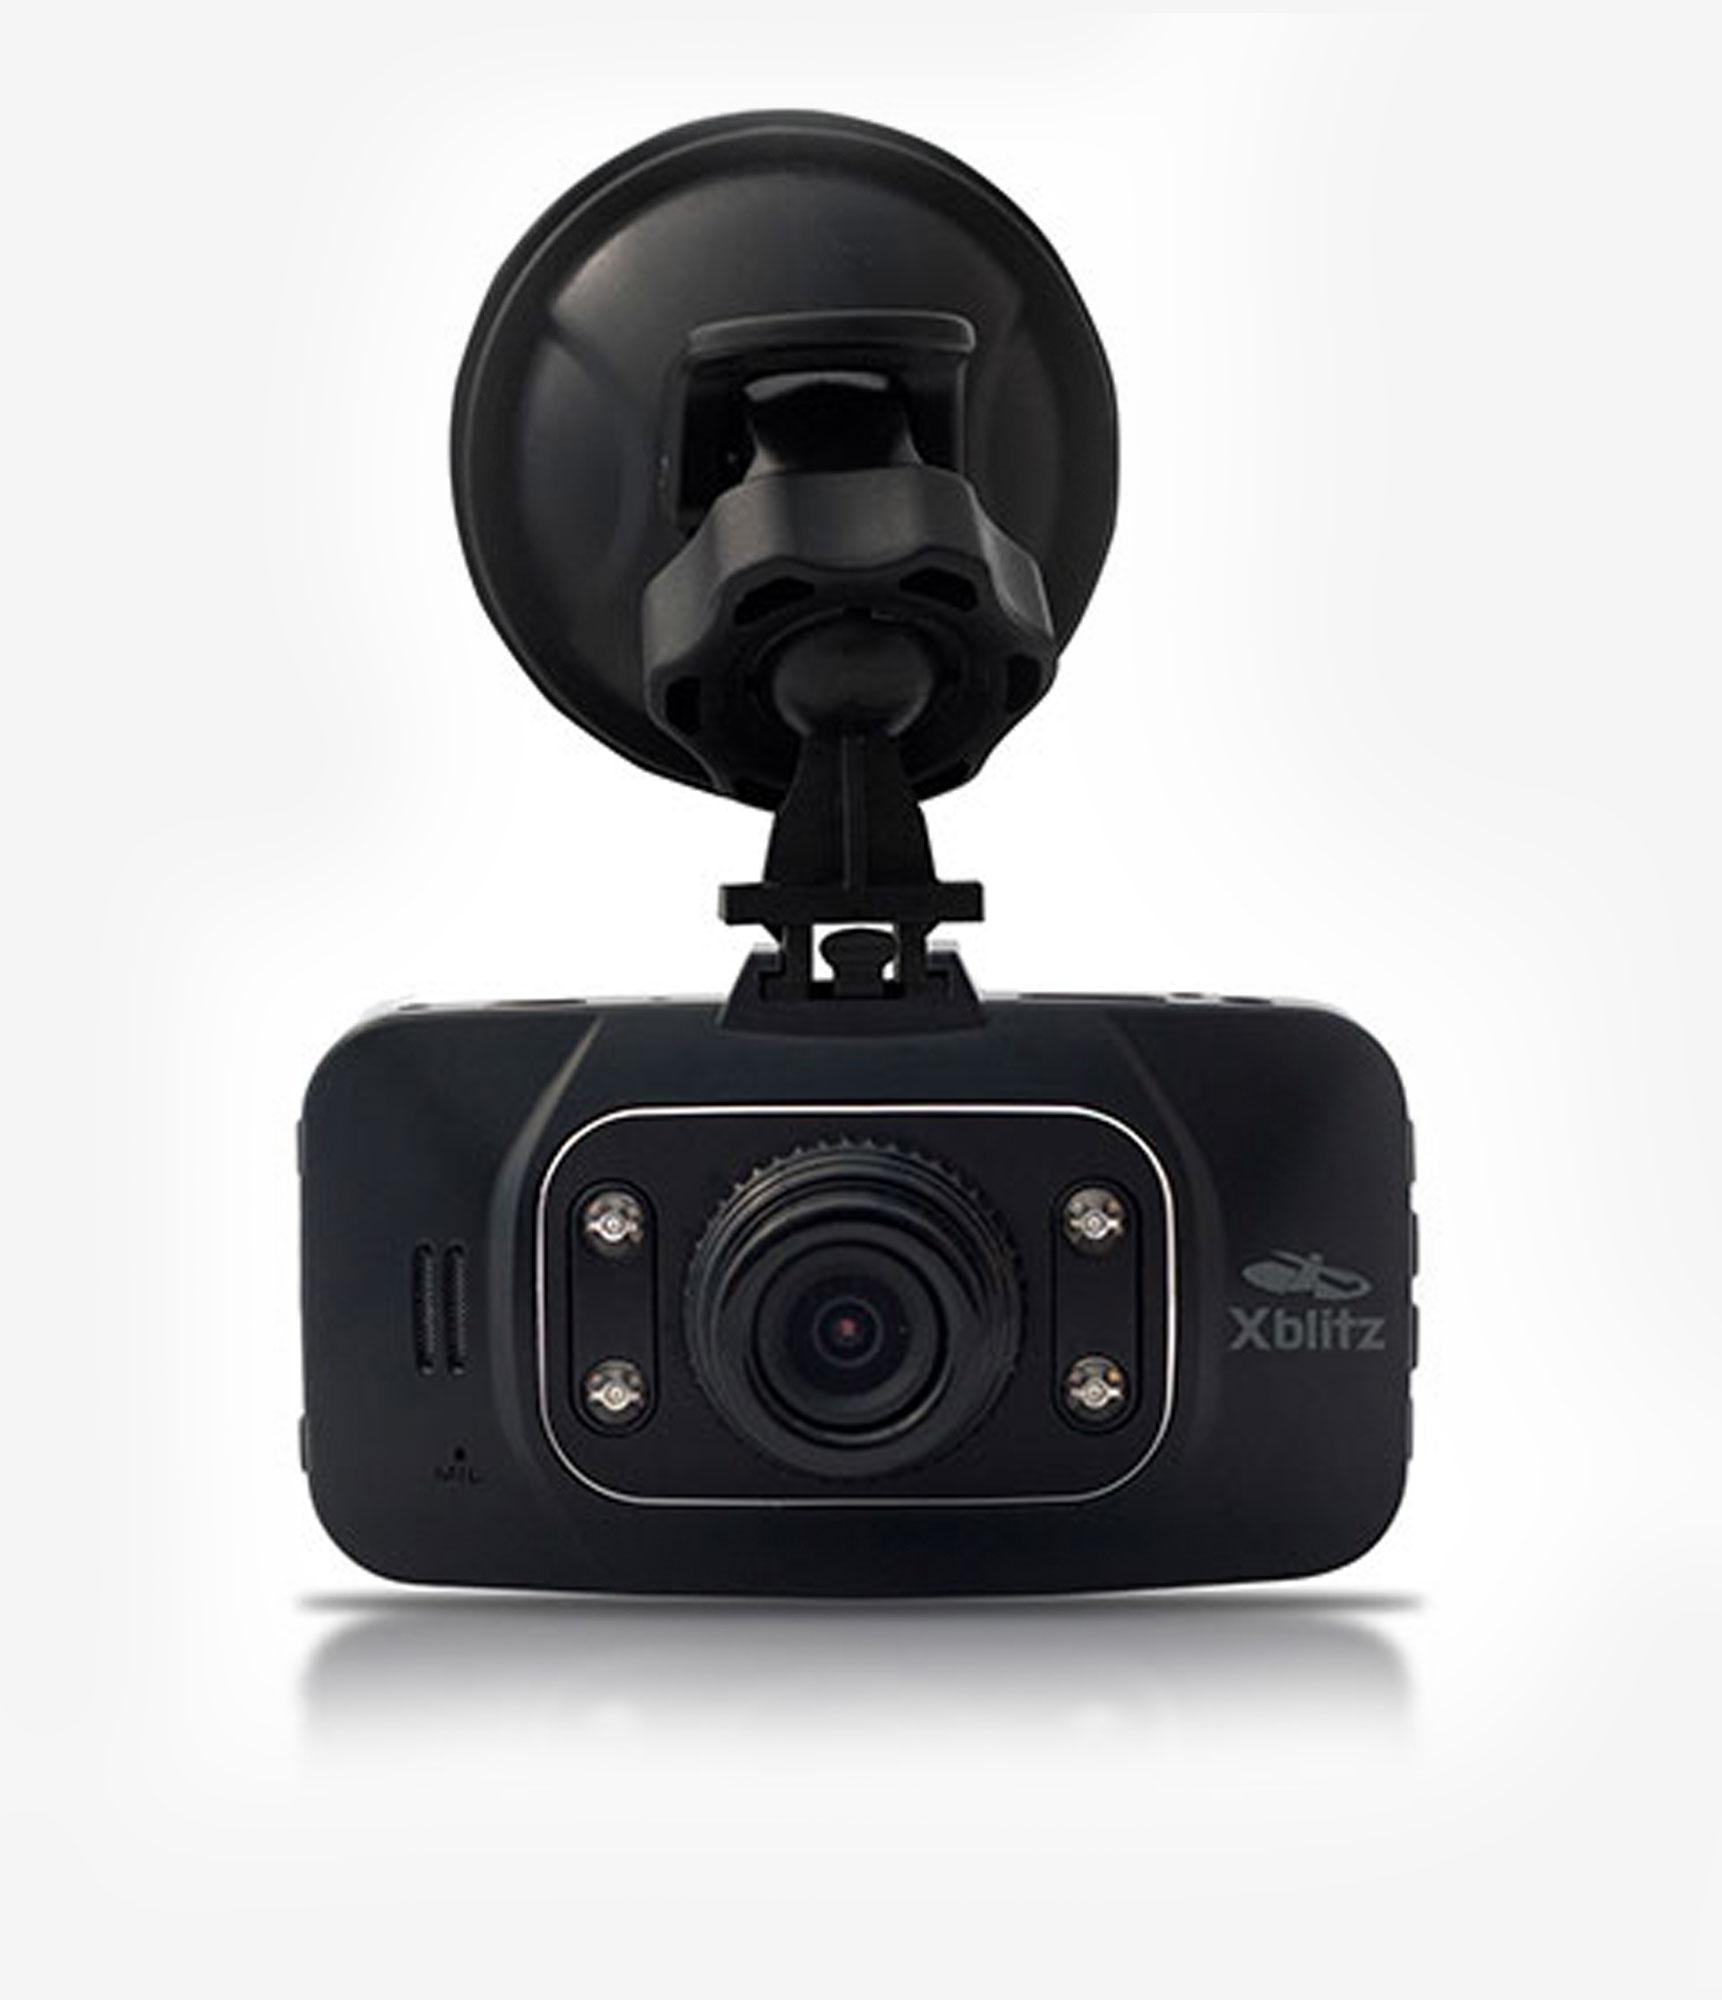 Camere video auto XBLITZ CLASSIC 5903240792146